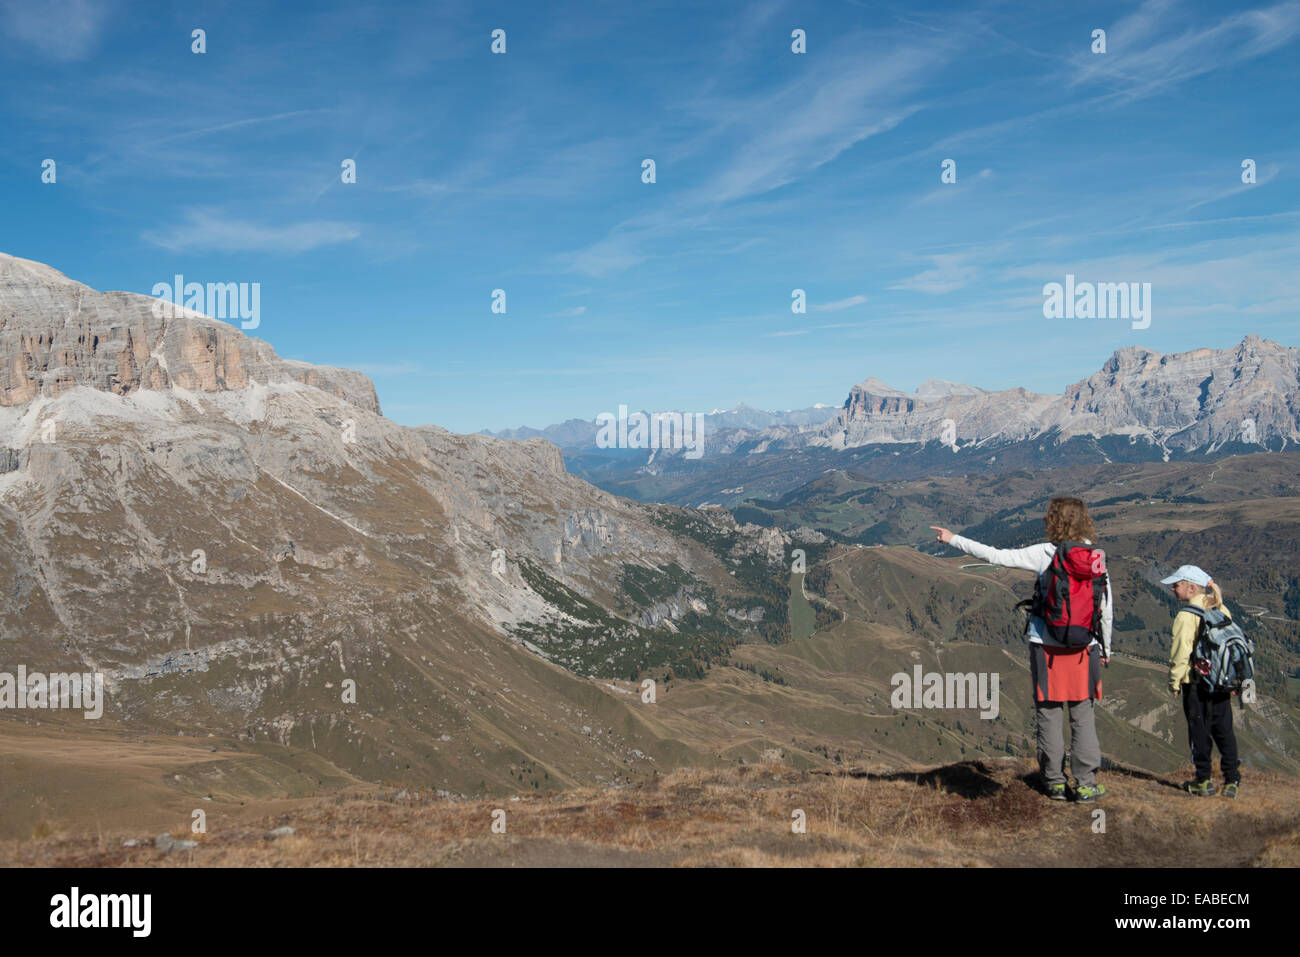 Frau und Kind wandern Dolomiten - Woman and children hiking in dolomites - Stock Image